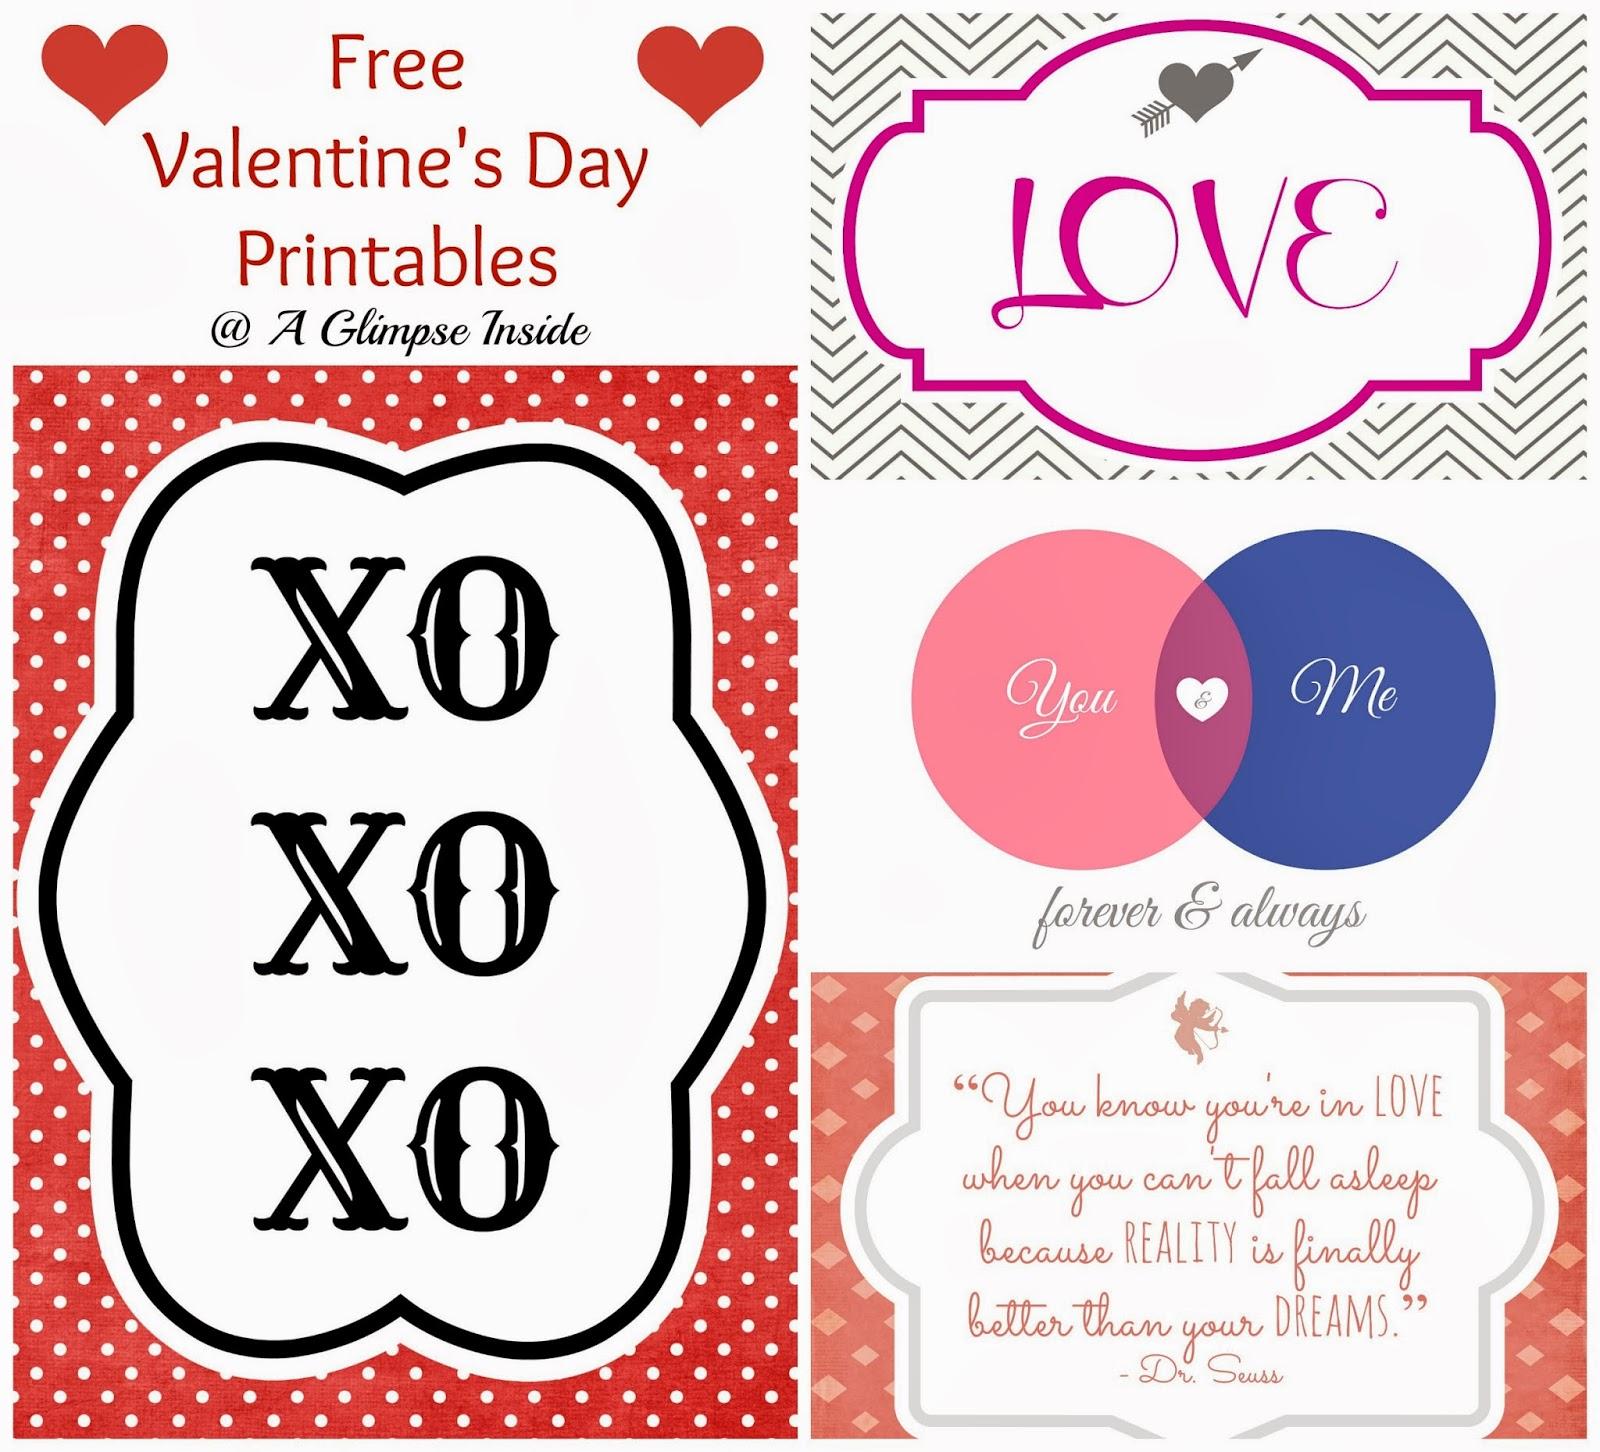 35 Free Printable Valentines